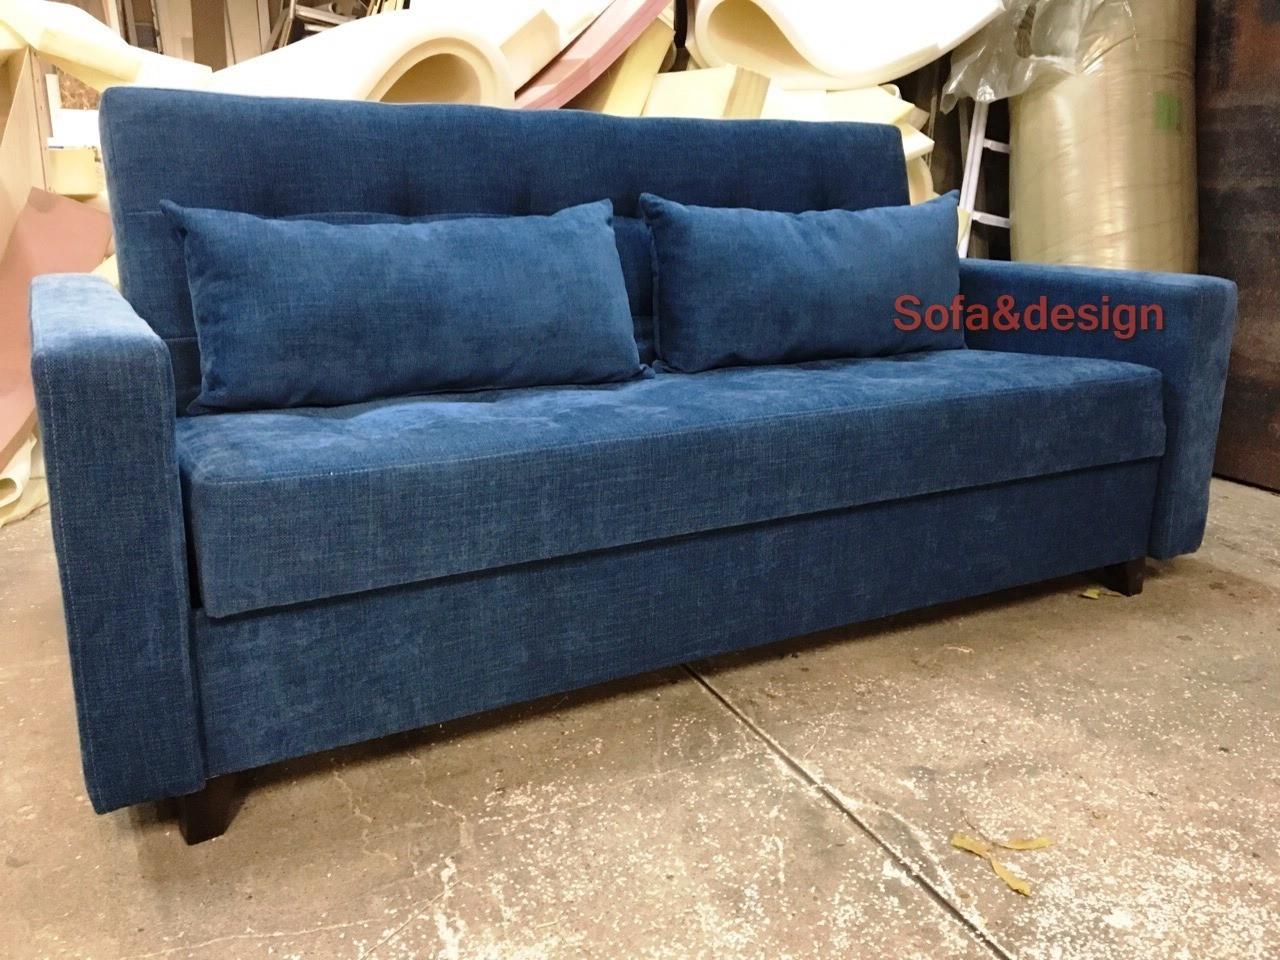 vkero65l - Перетяжка мягкой мебели